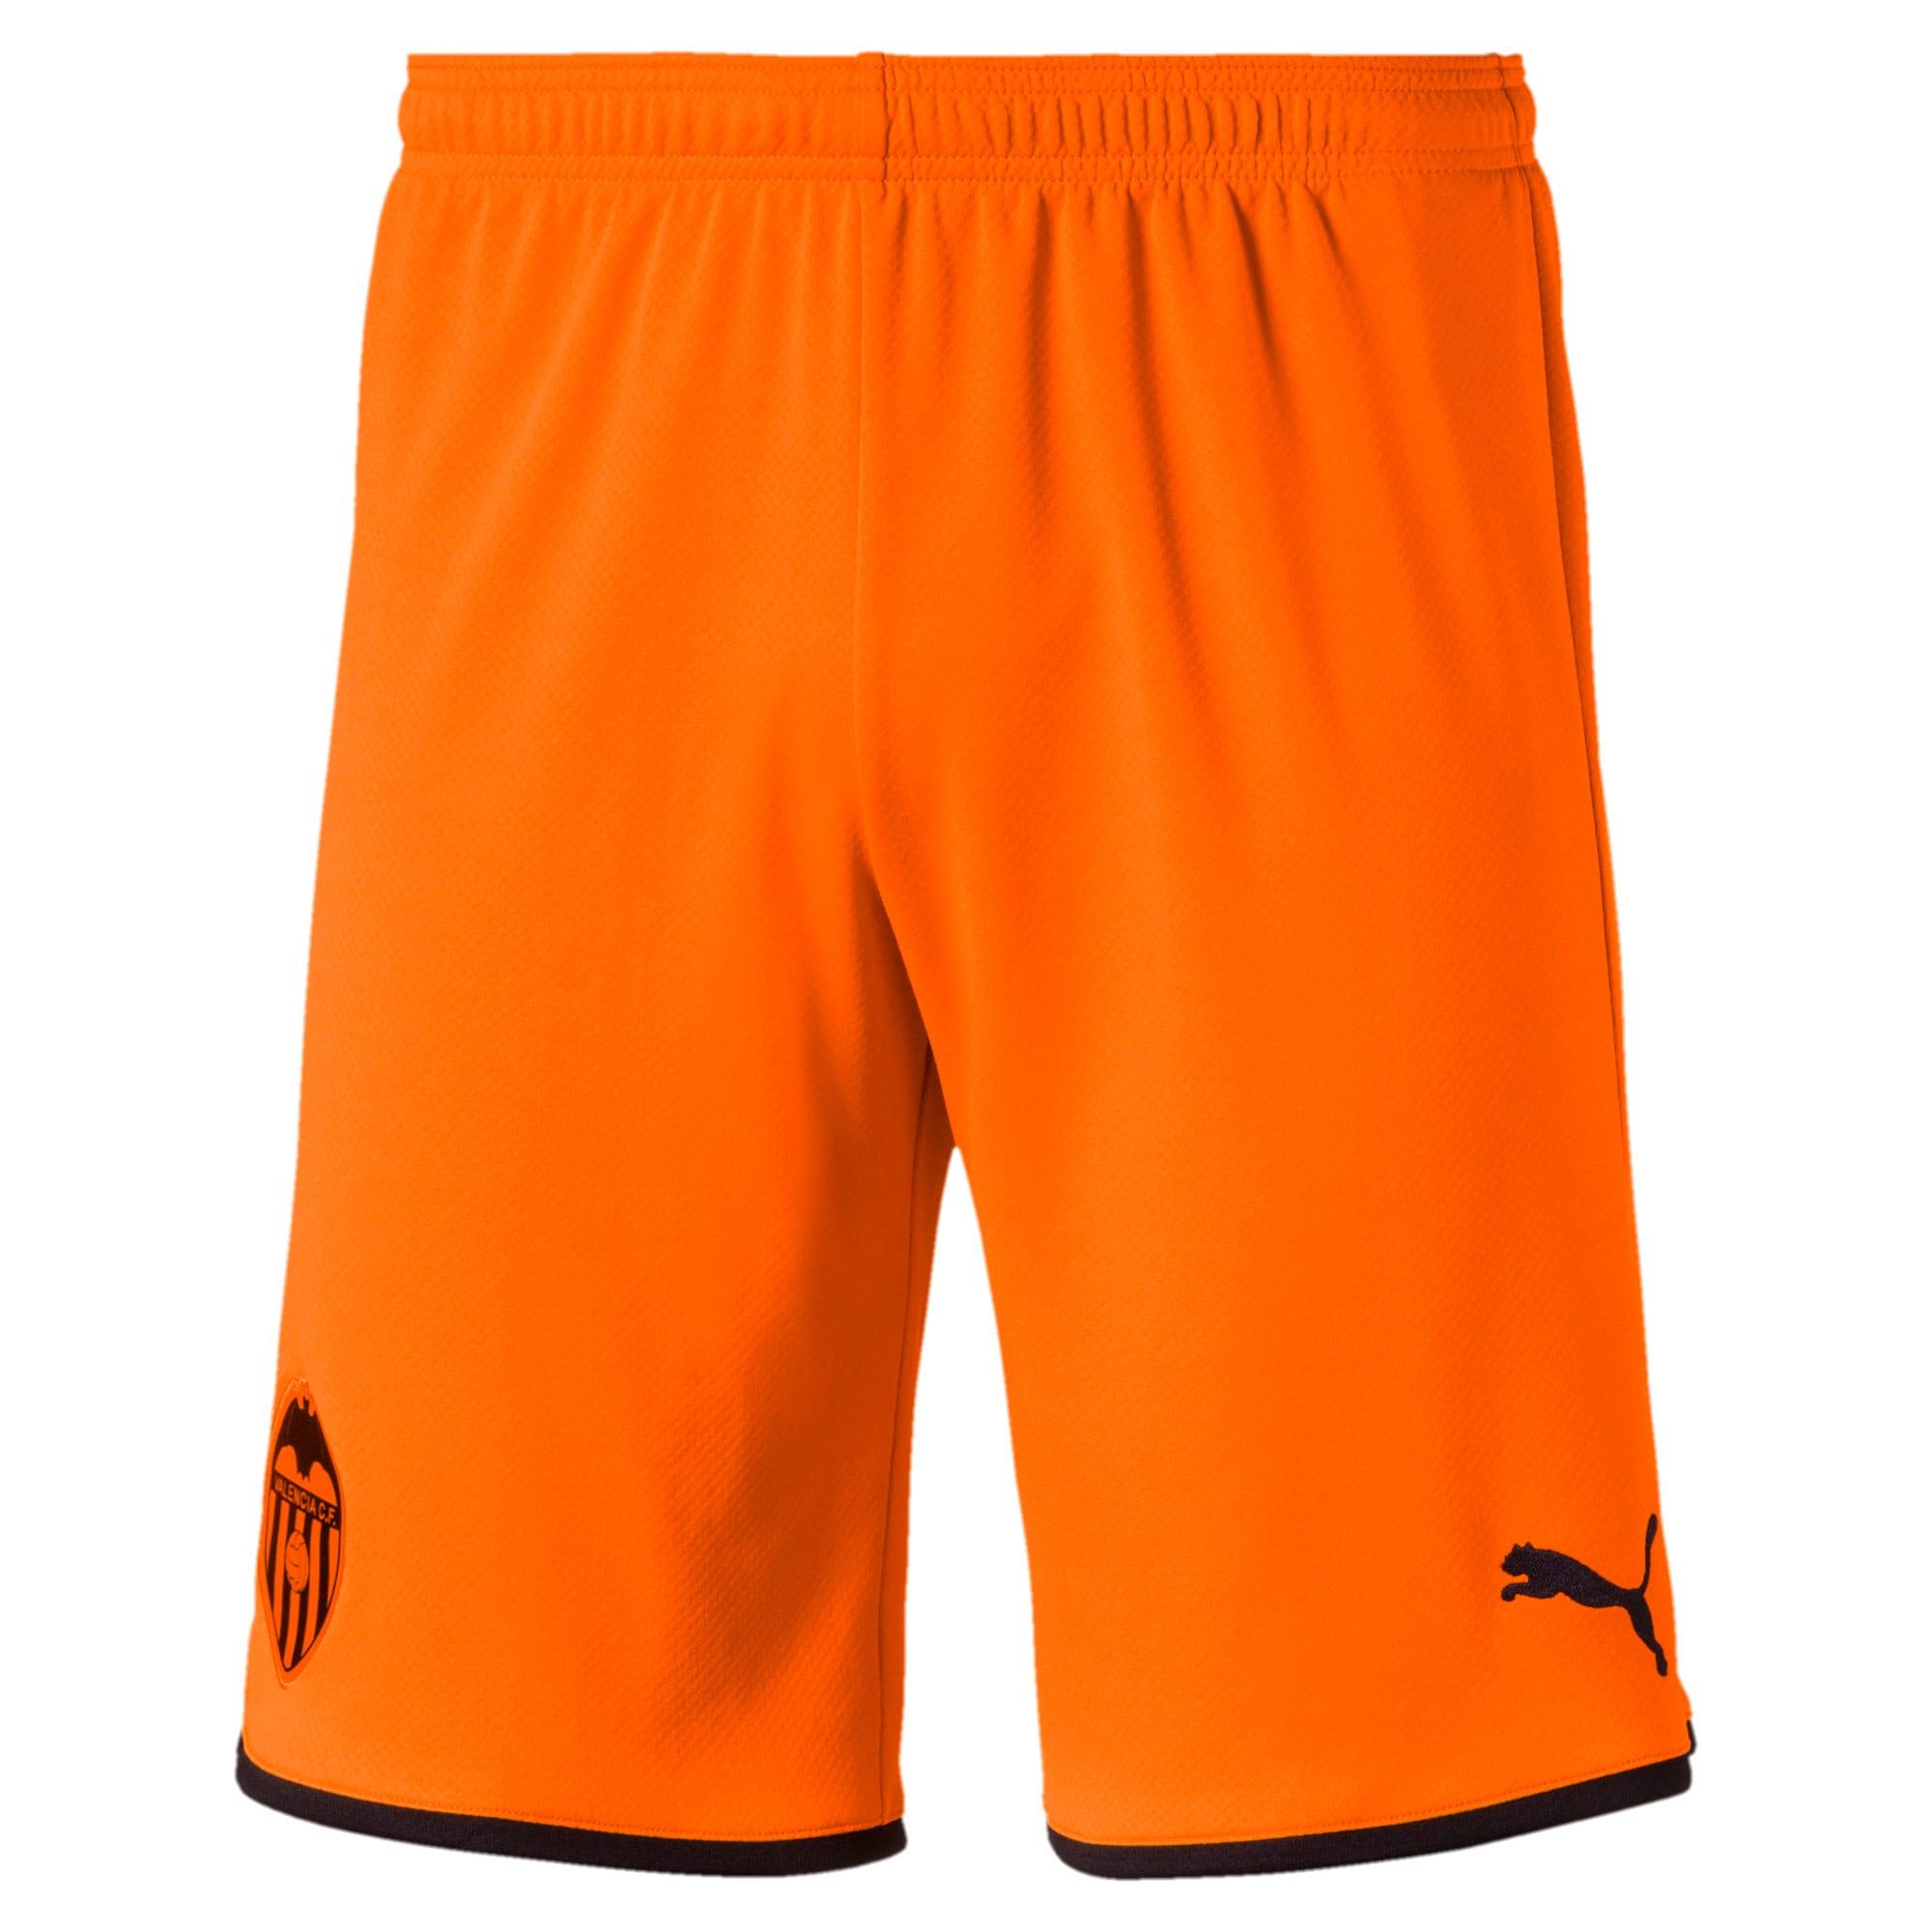 Thumbnail 1 of Valencia CF Men's Replica Shorts, Vibrant Orange-Puma Black, medium